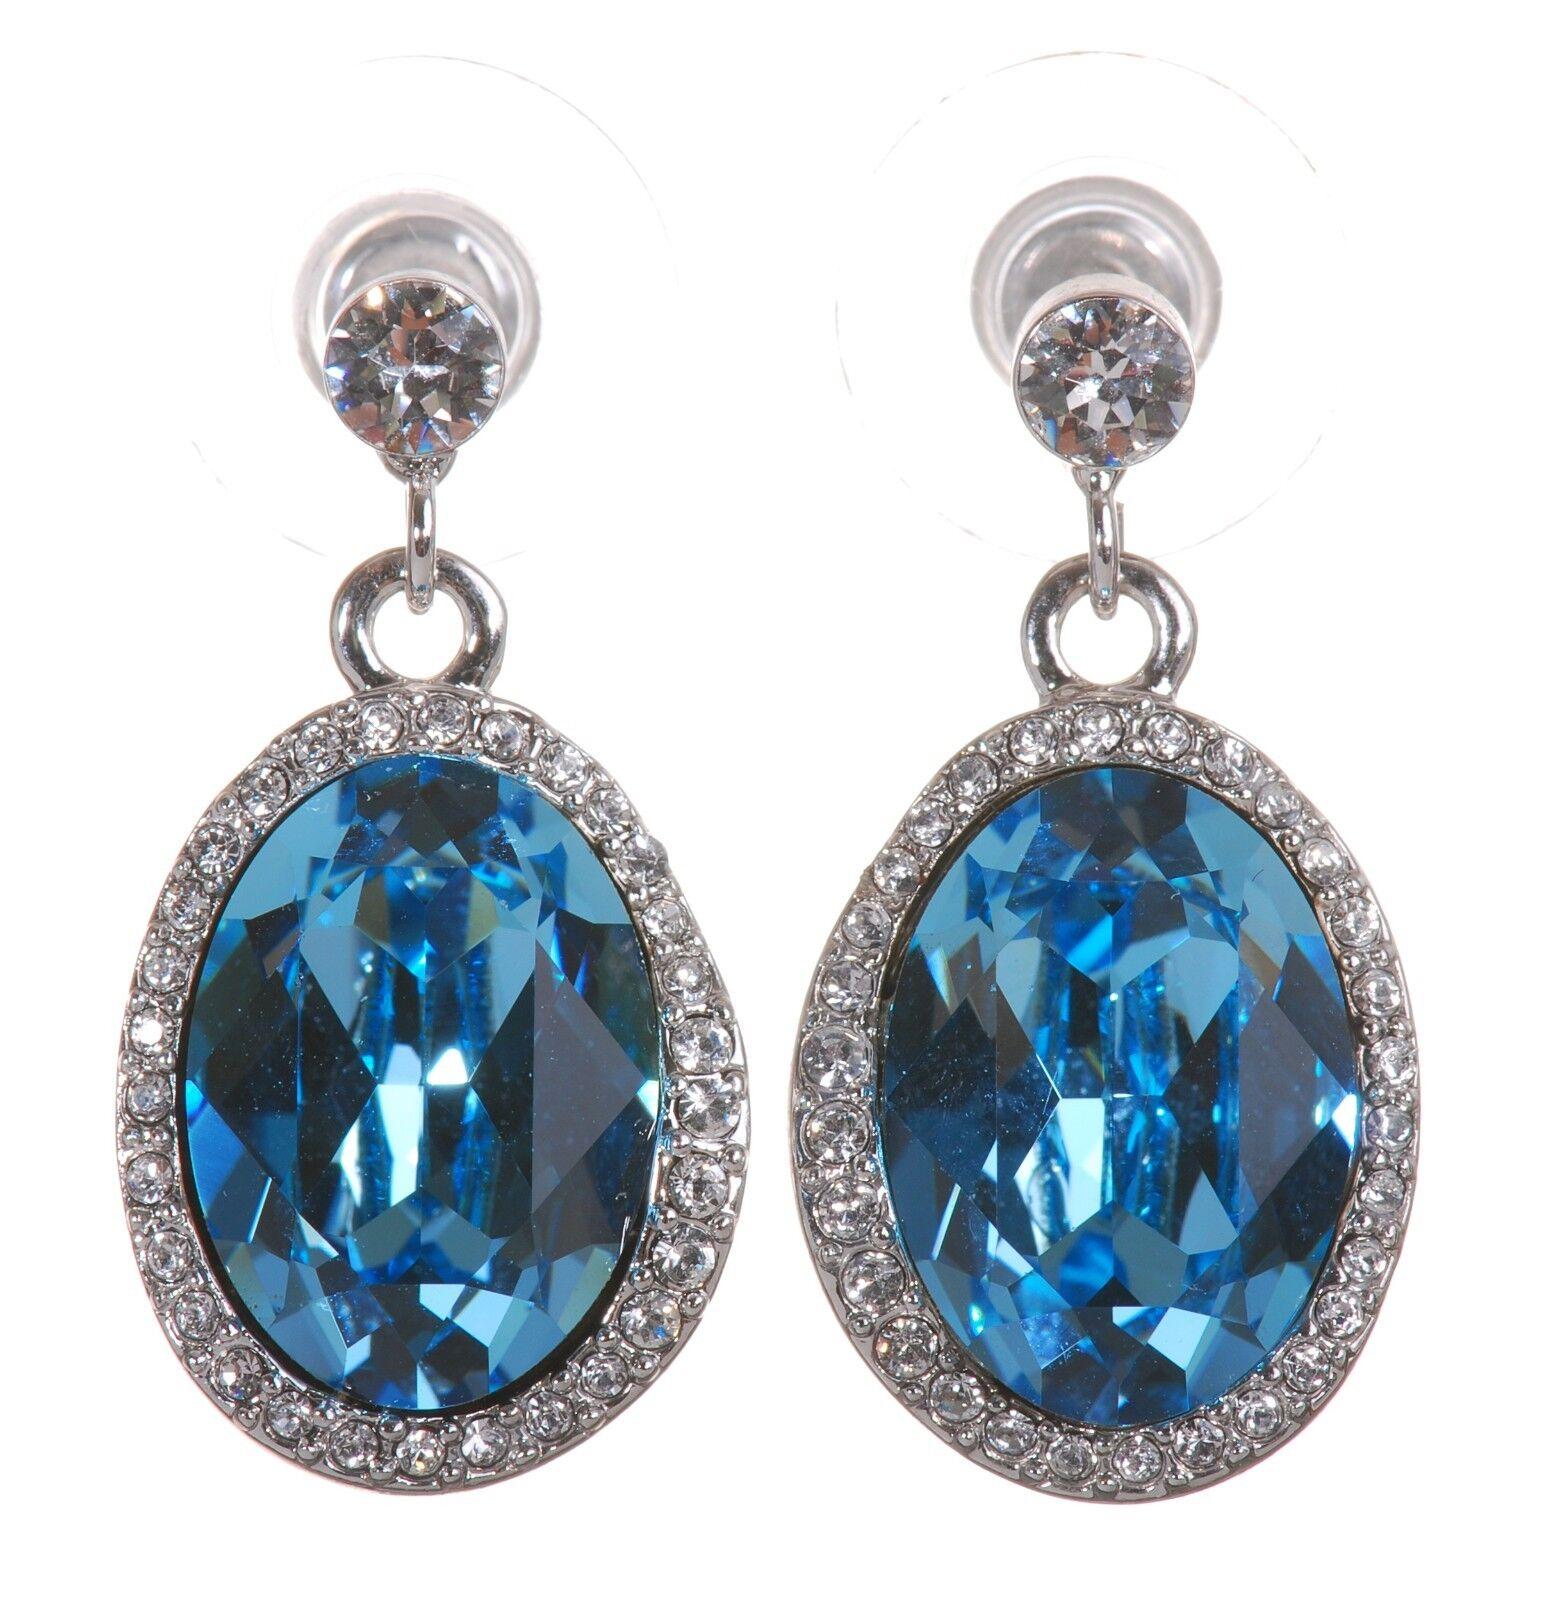 Swarovski Elements Crystal Calista Oval Halo Earrings Rhodium Authentic 7268u